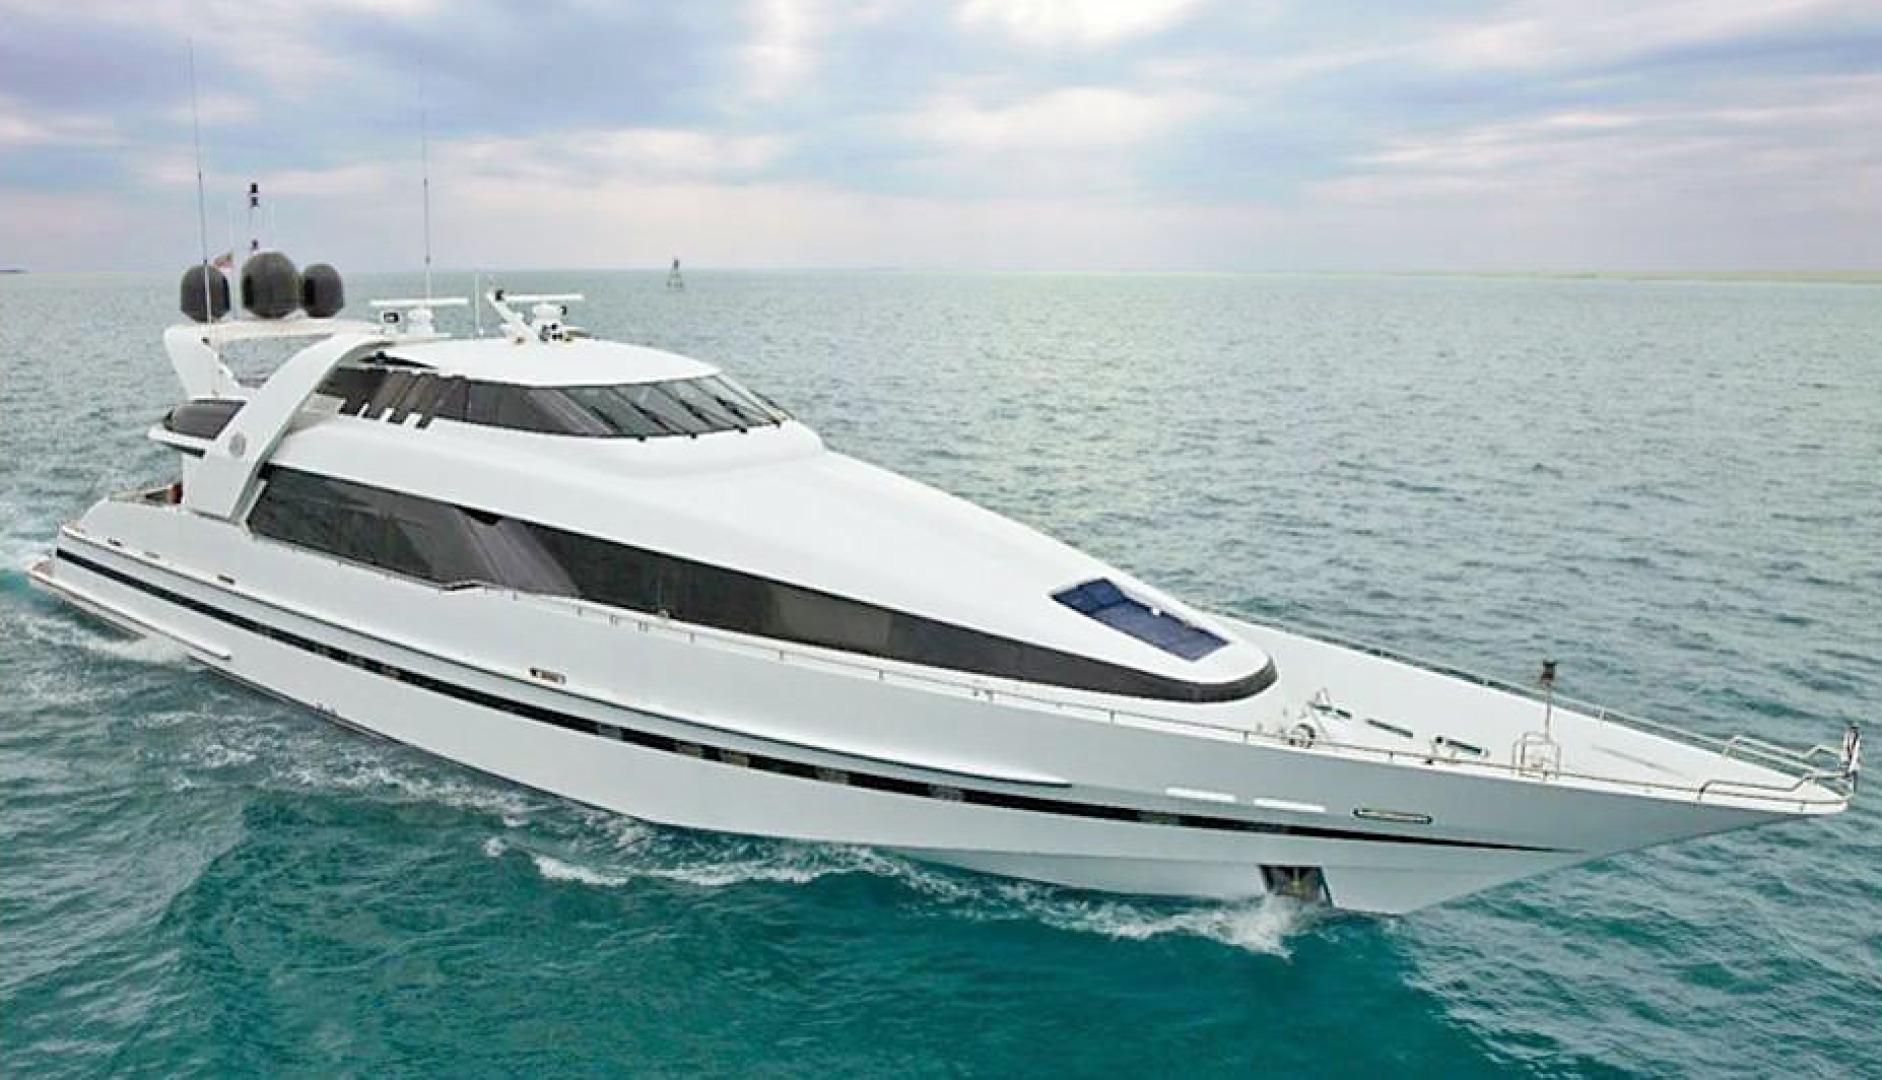 Motor Yacht-Norship 1994-Impulsive Fort Lauderdale-Florida-United States-1562559 | Thumbnail